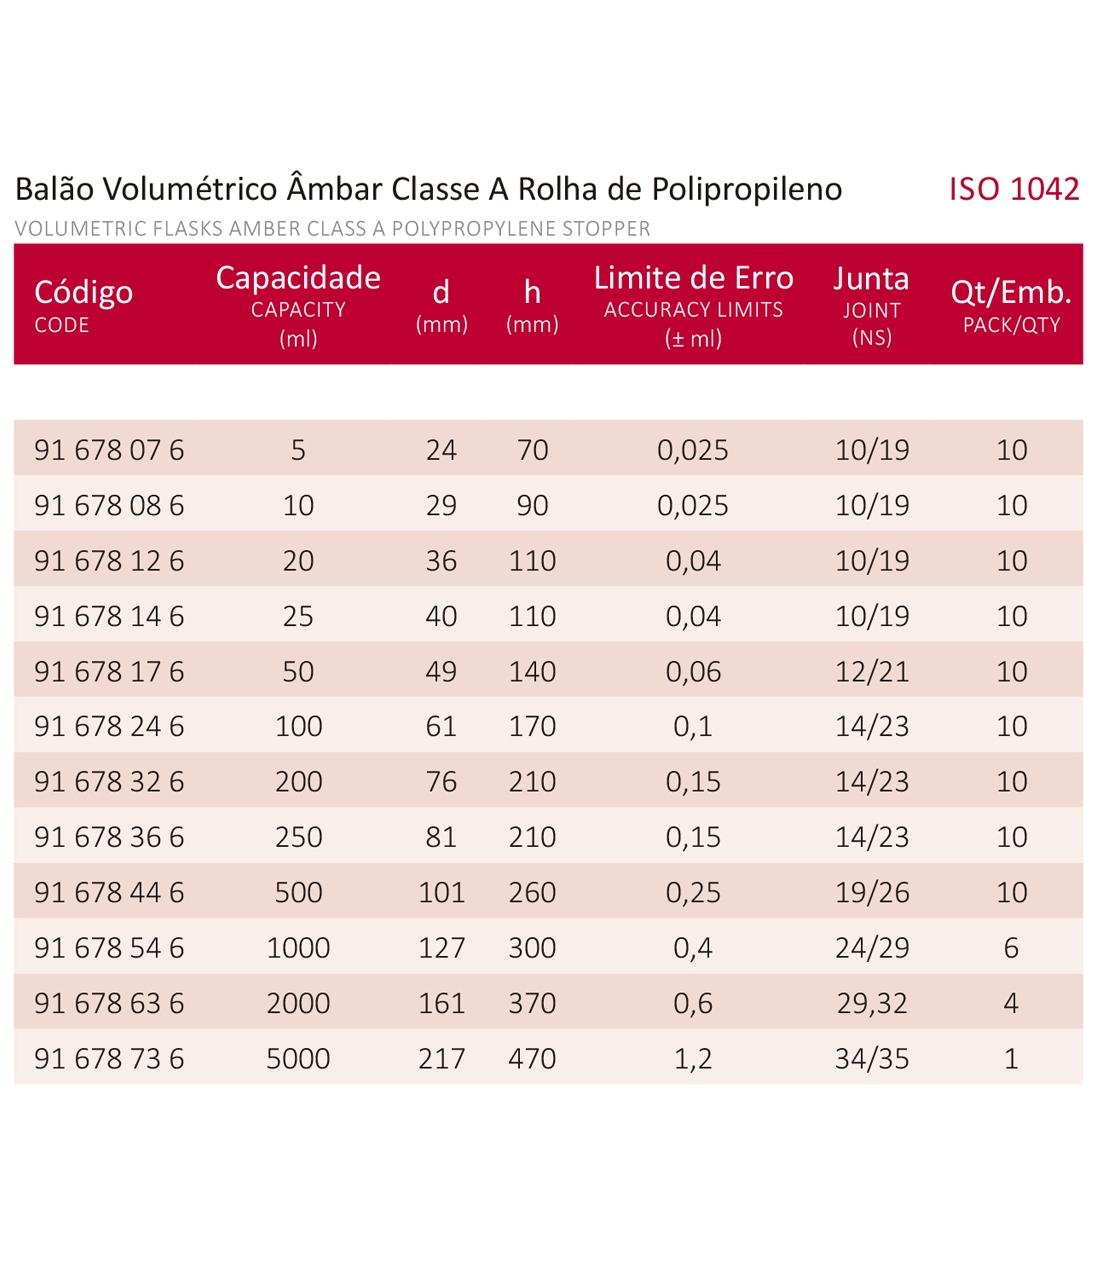 BALÃO VOLUMÉTRICO CLASSE A ROLHA POLI ÂMBAR C/ CERTIFICADO RBC 200 ML - Marca Laborglas - Cód. 91678326-R